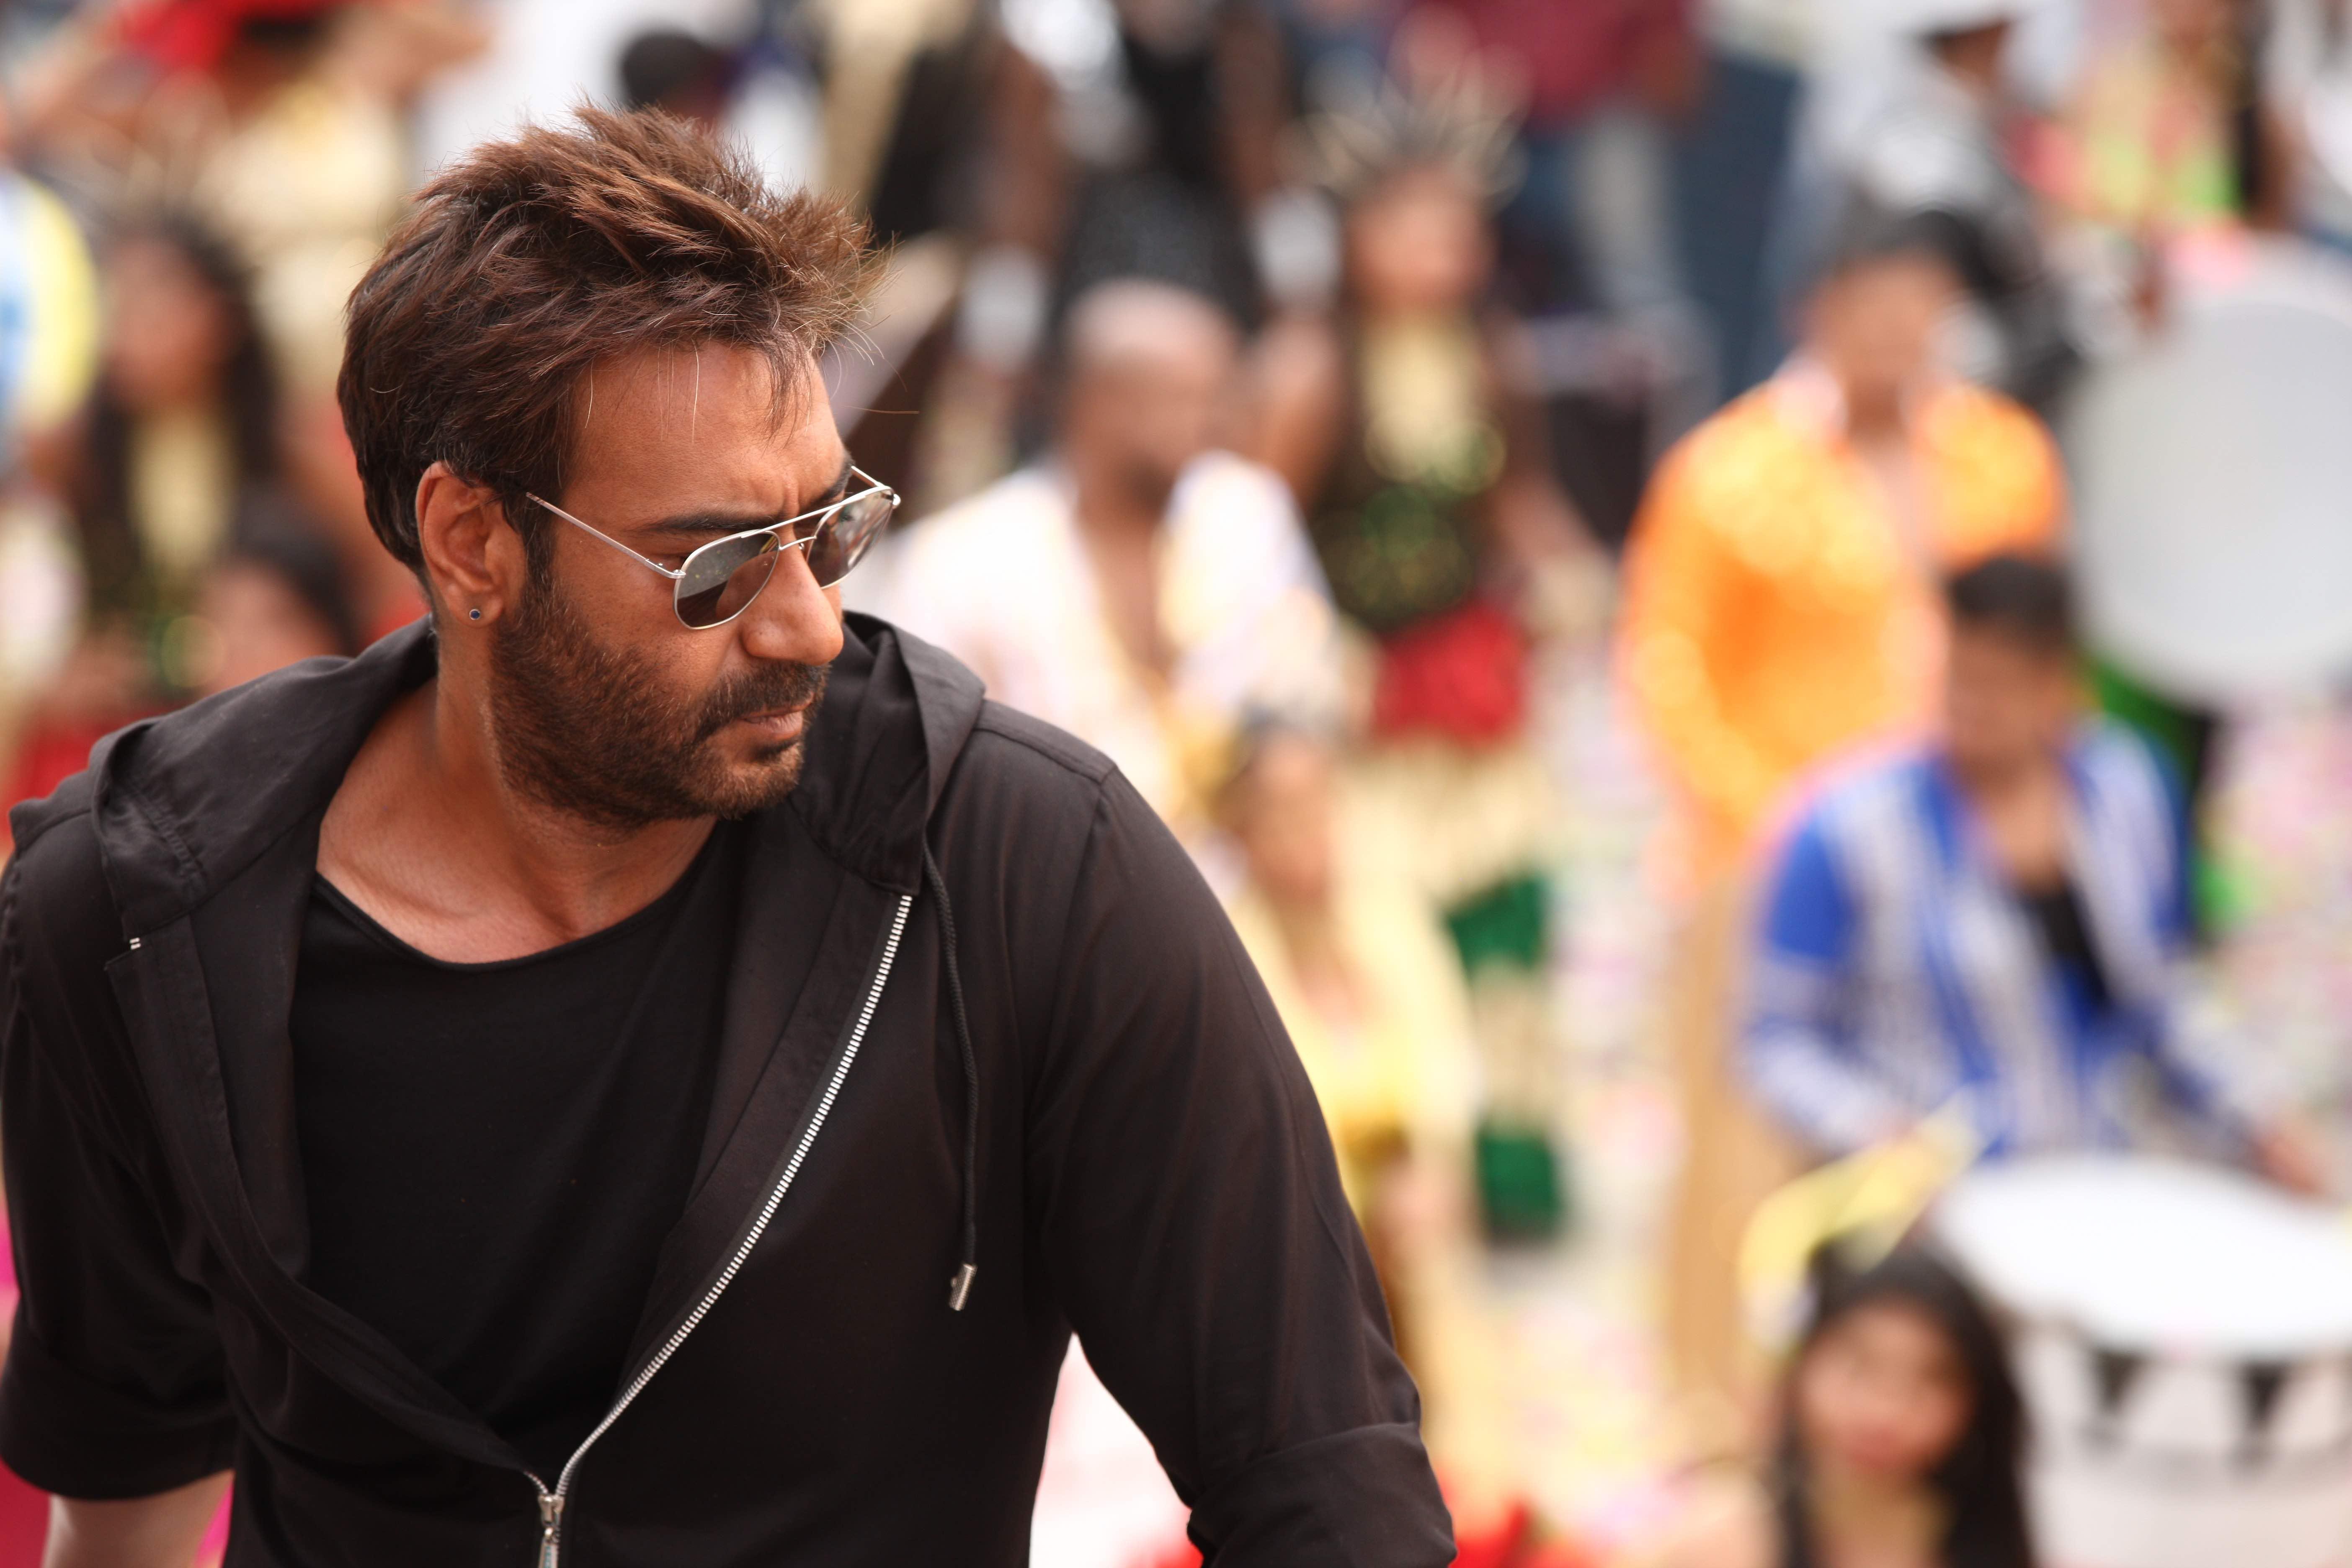 Ajay Devgn roped in for chanakya